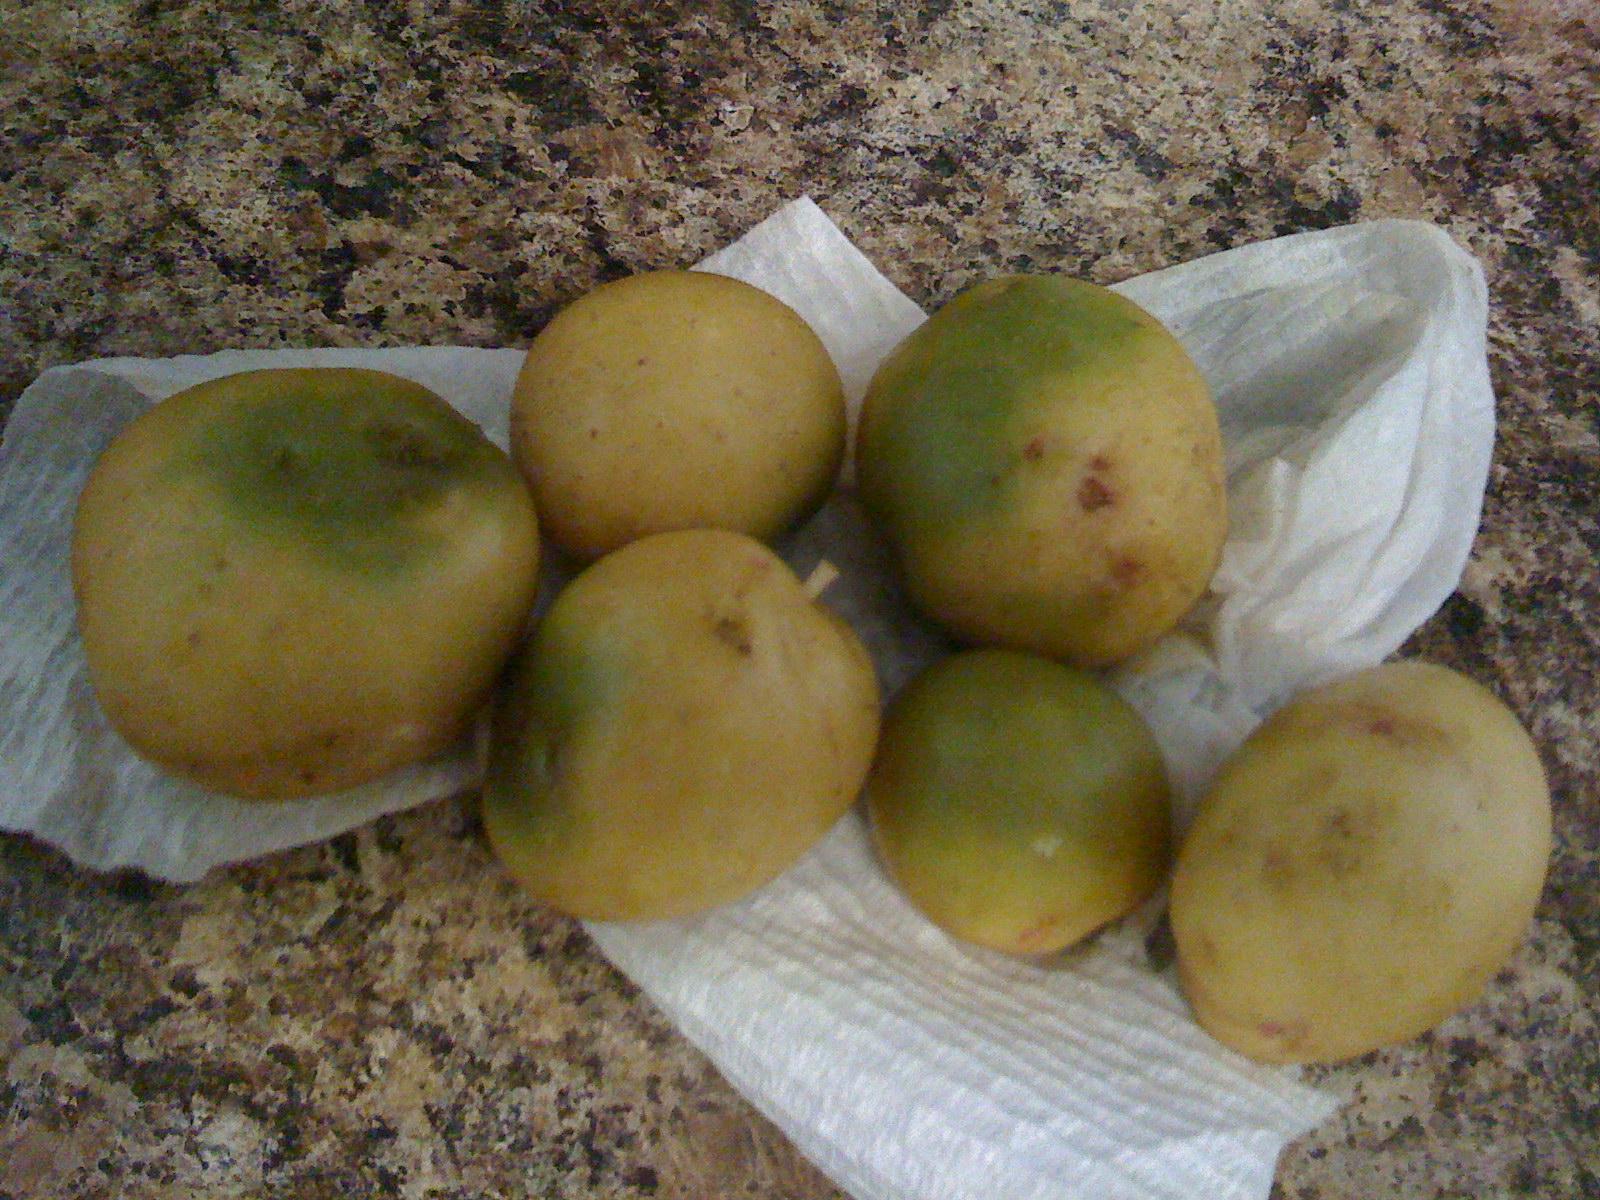 Rinsed Green Potatoes